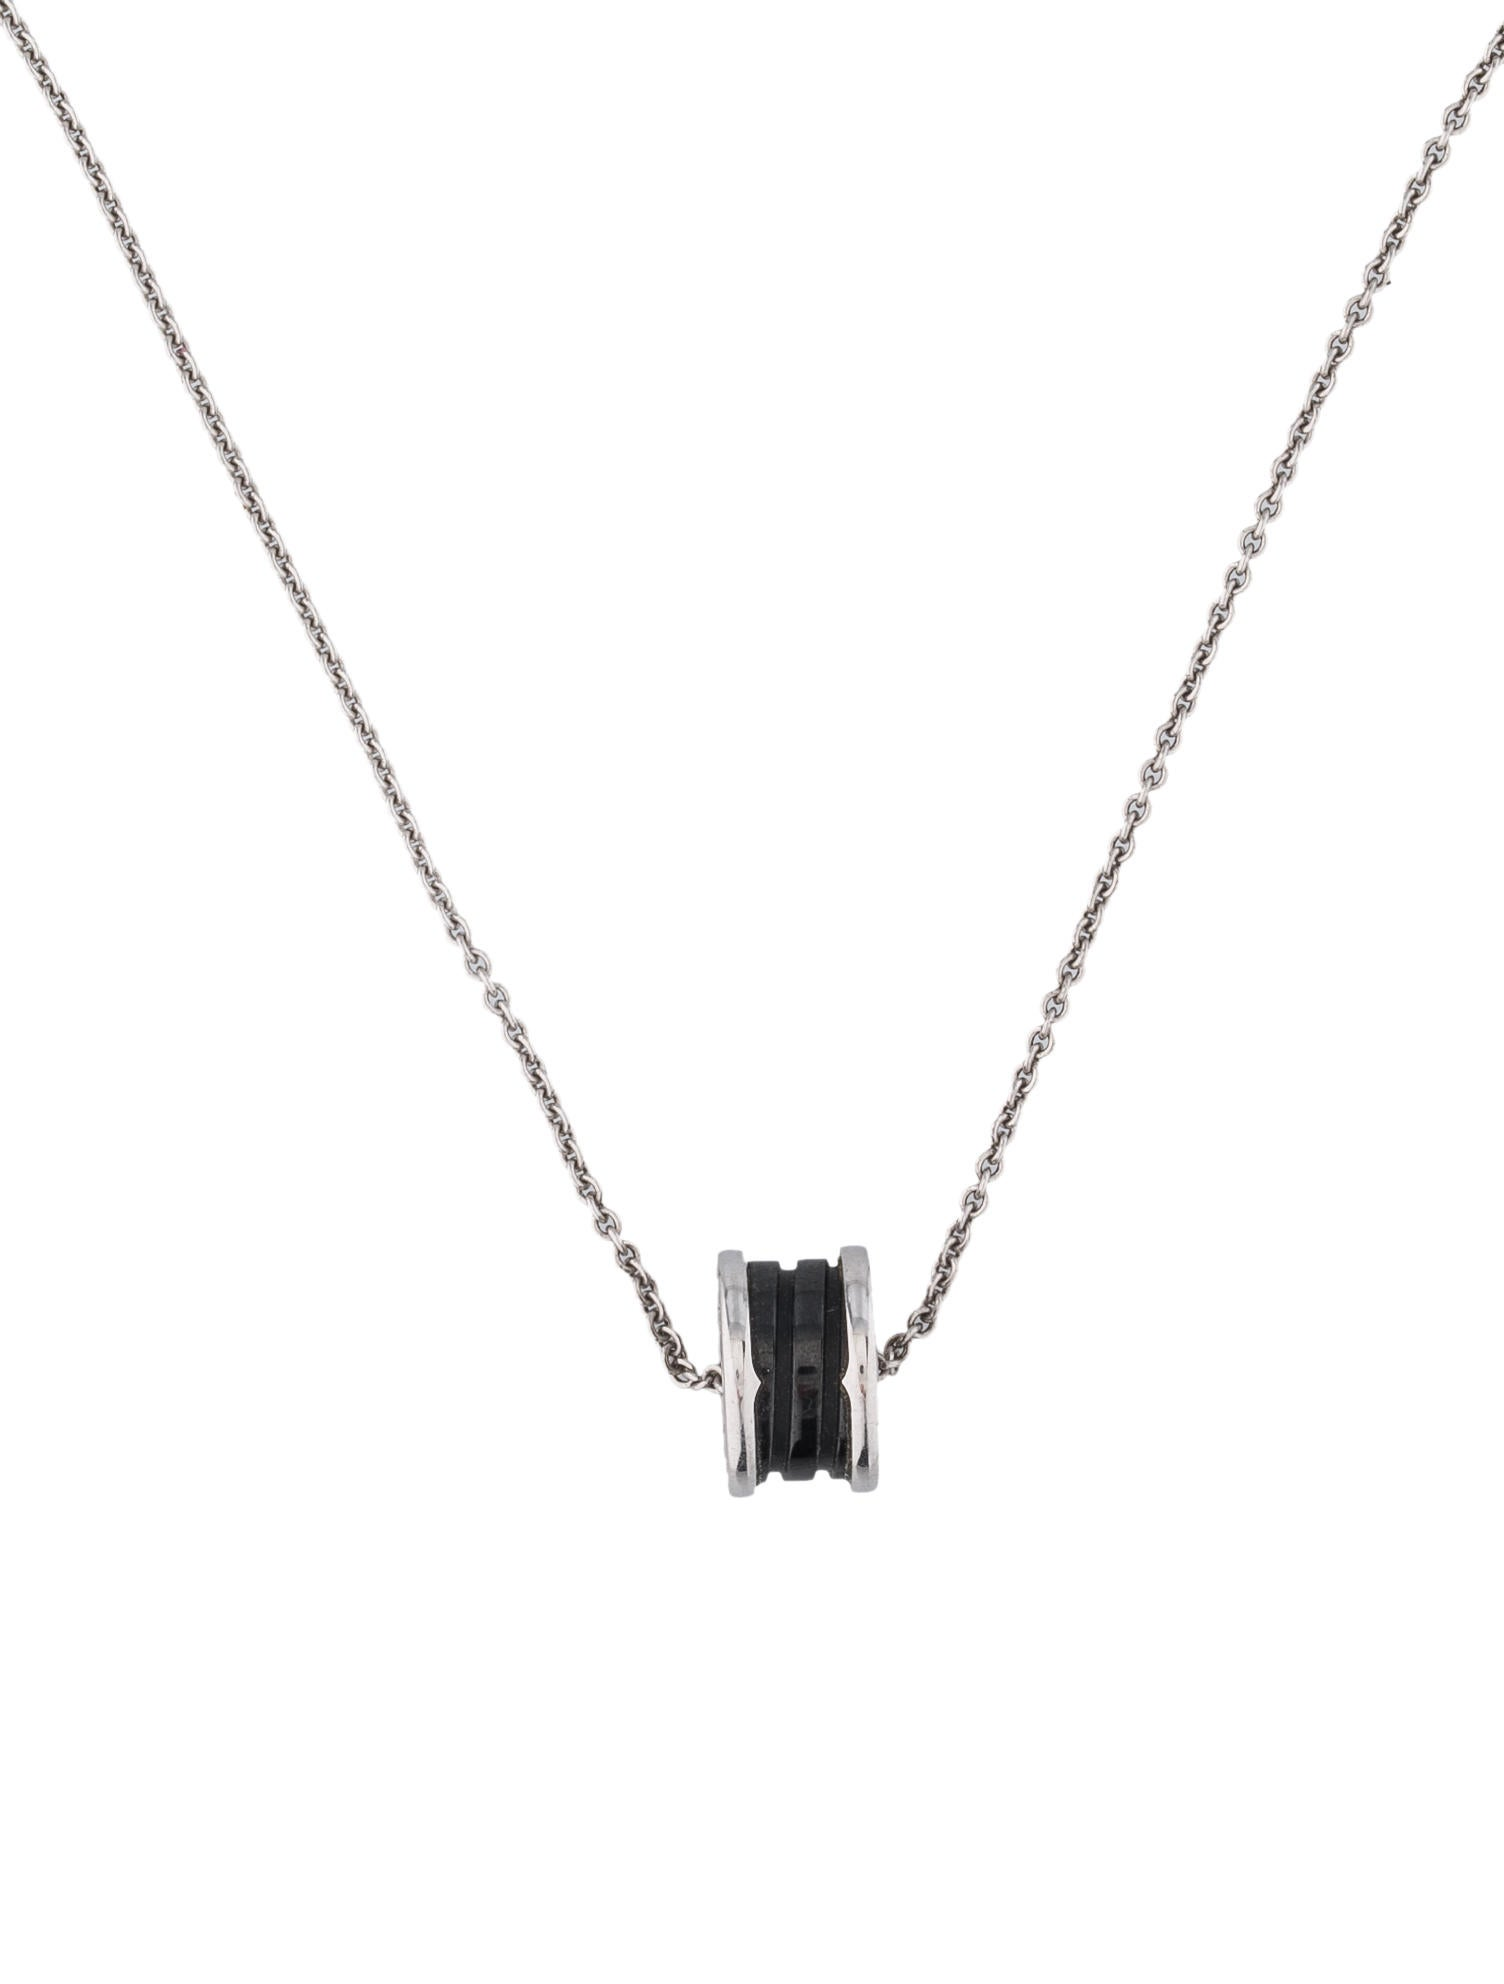 bvlgari b zero1 necklace necklaces bul20875 the